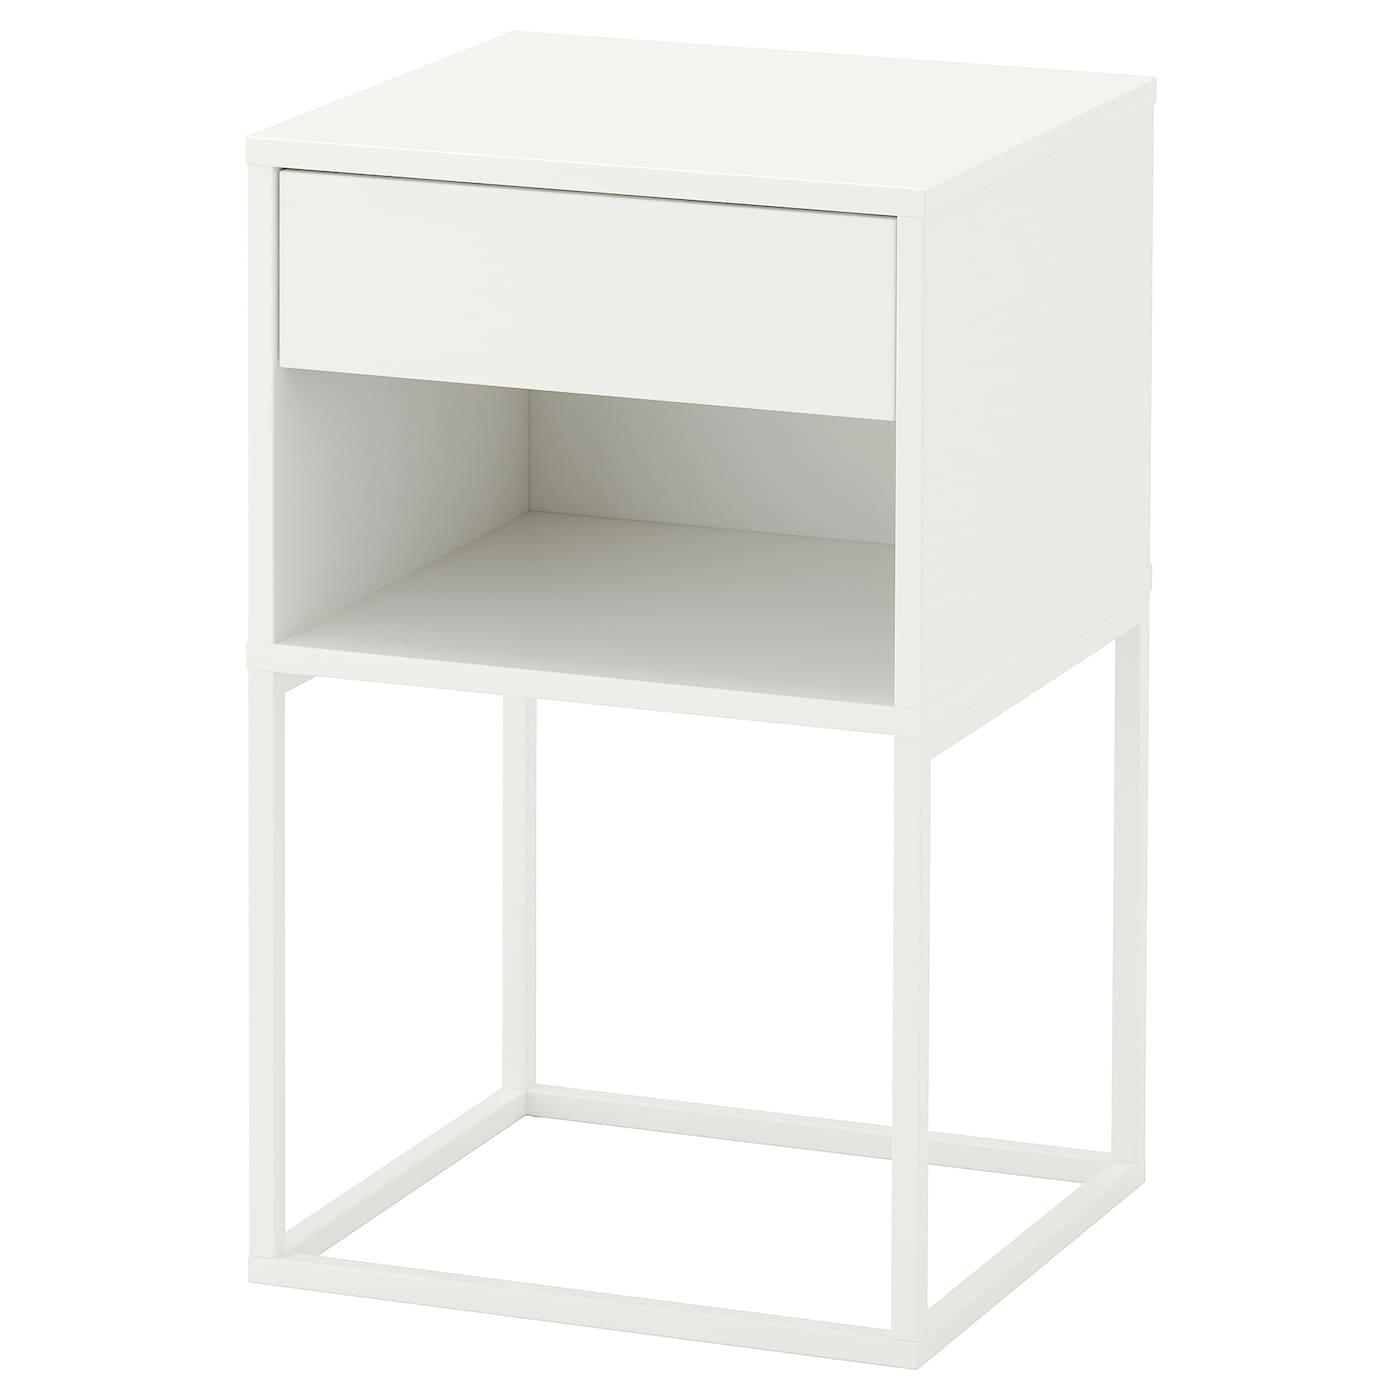 Picture of: Vikhammer White Bedside Table 40×39 Cm Ikea